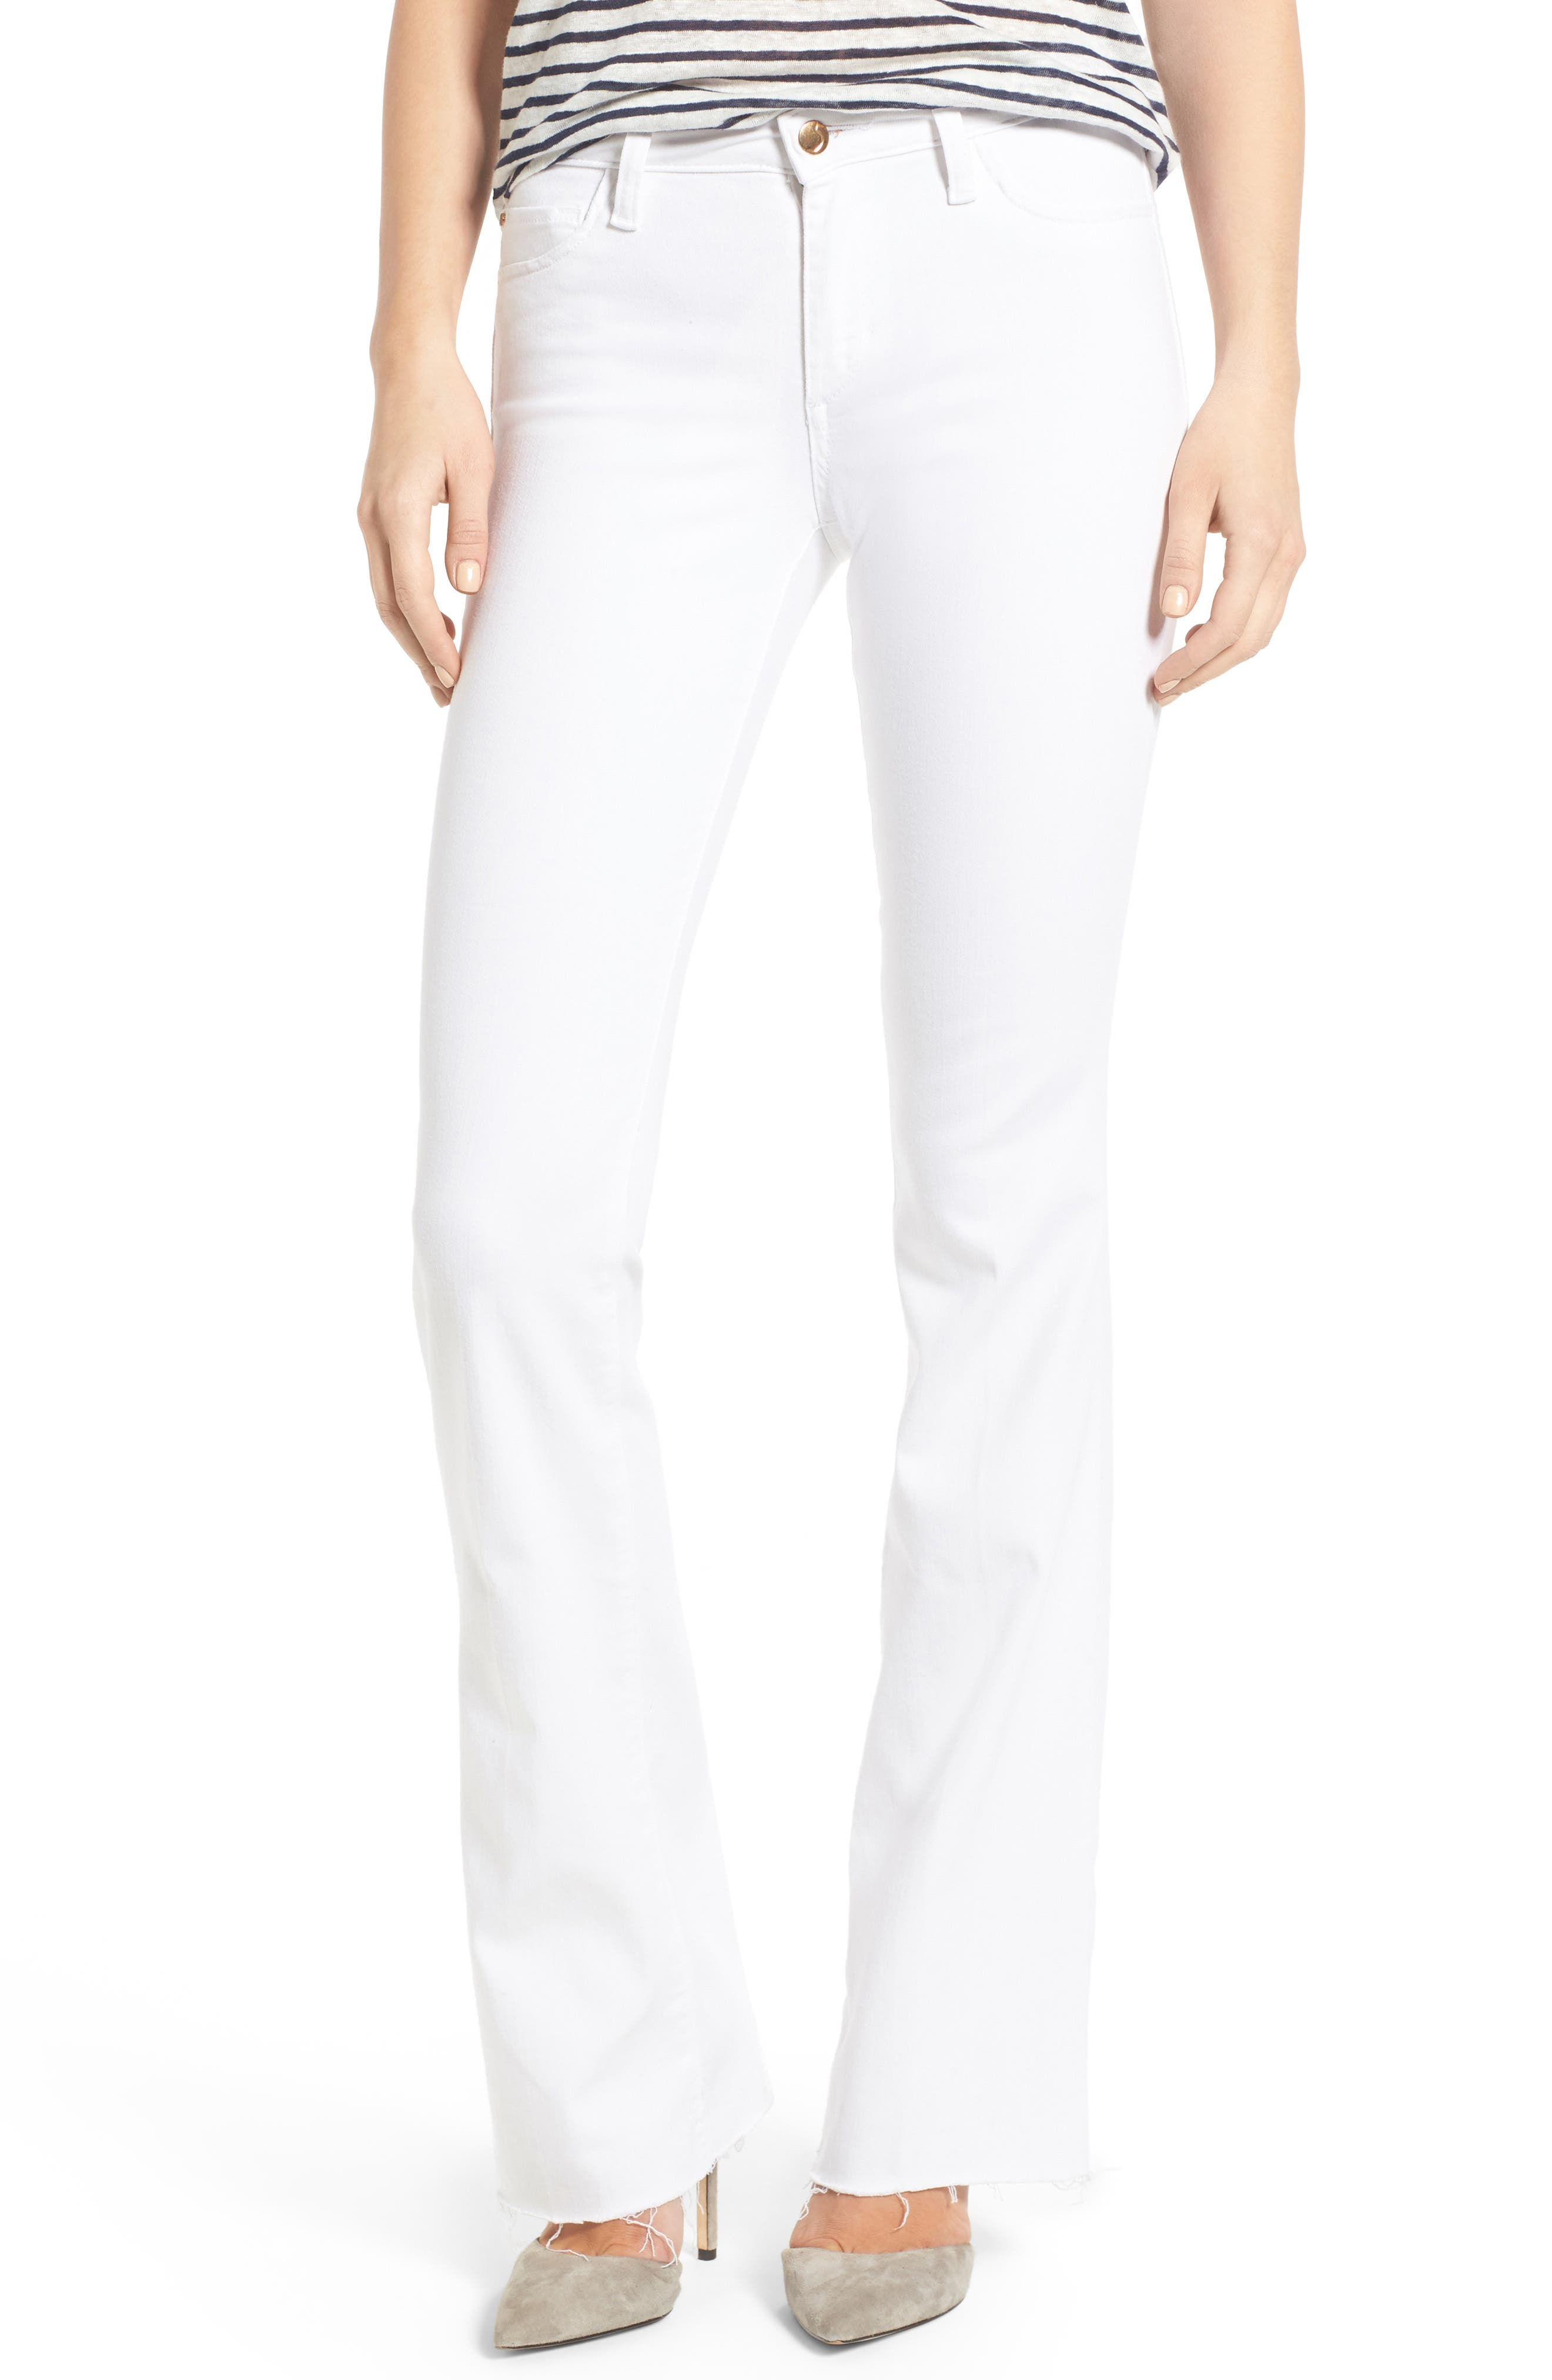 JOE'S Flawless - Honey Curvy Bootcut Jeans